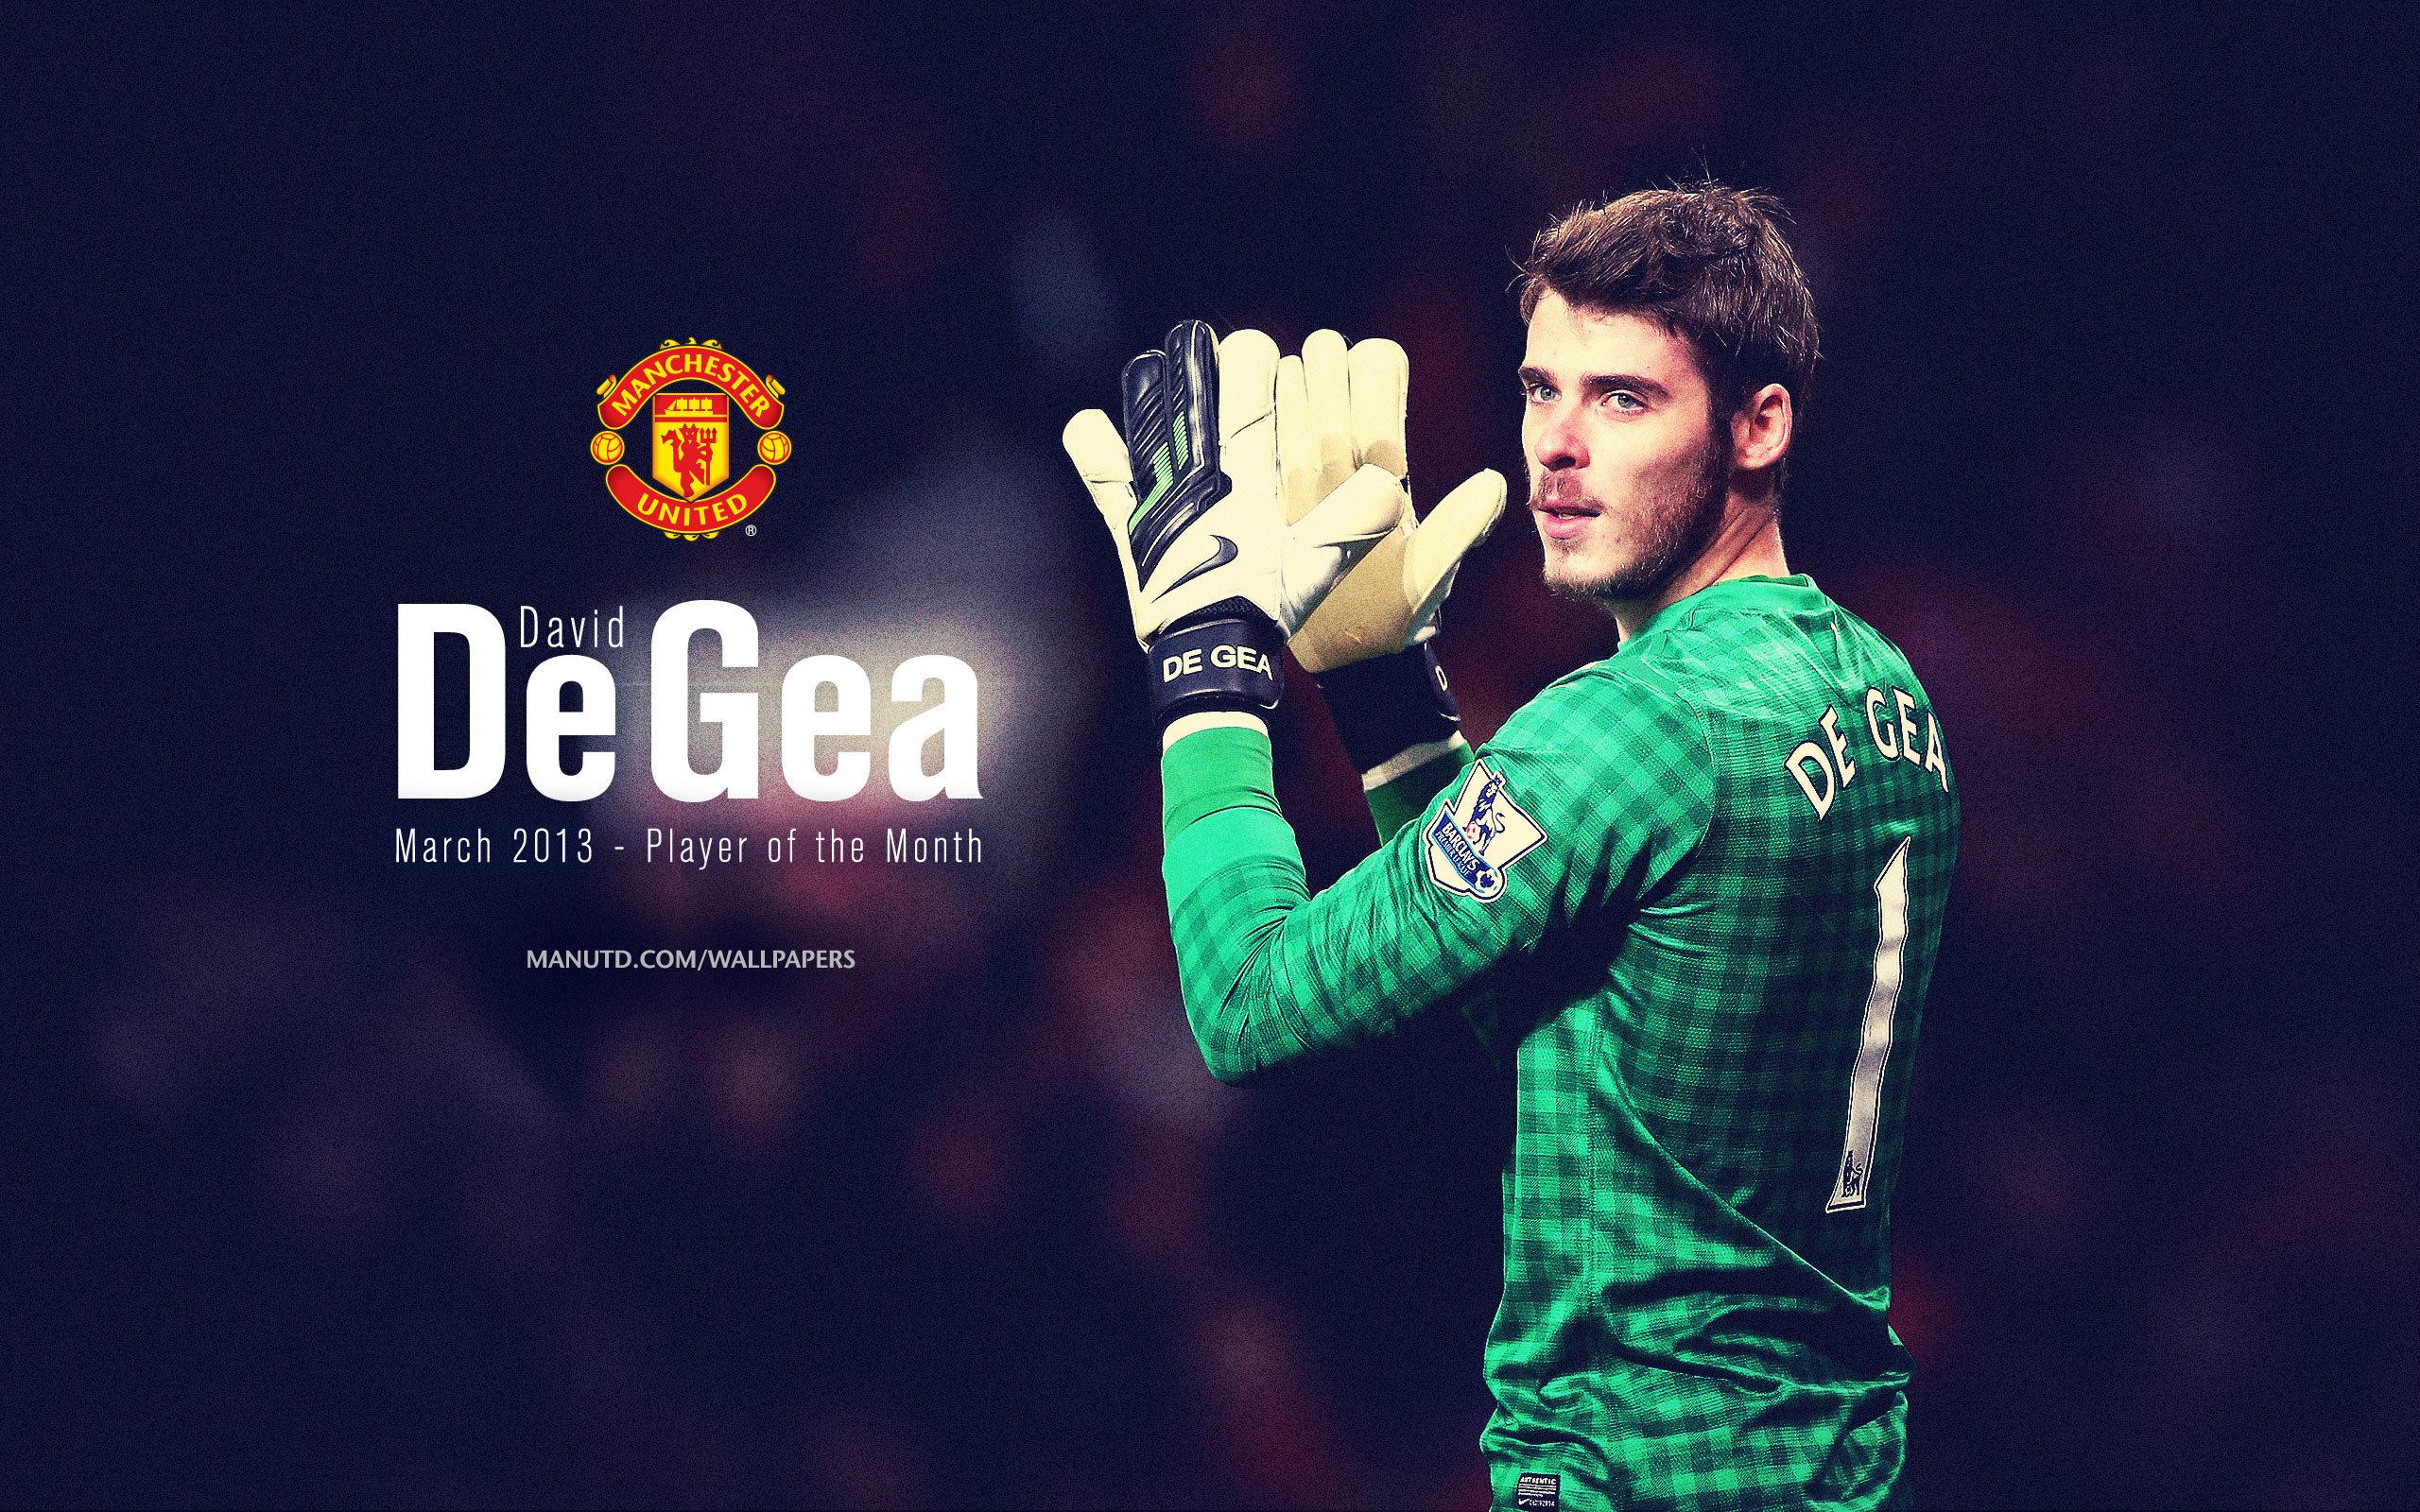 Вокруг и около футбола. - Страница 3 _The_player_of_Manchester_United_David_De_Gea_in_dark_colors_049384_